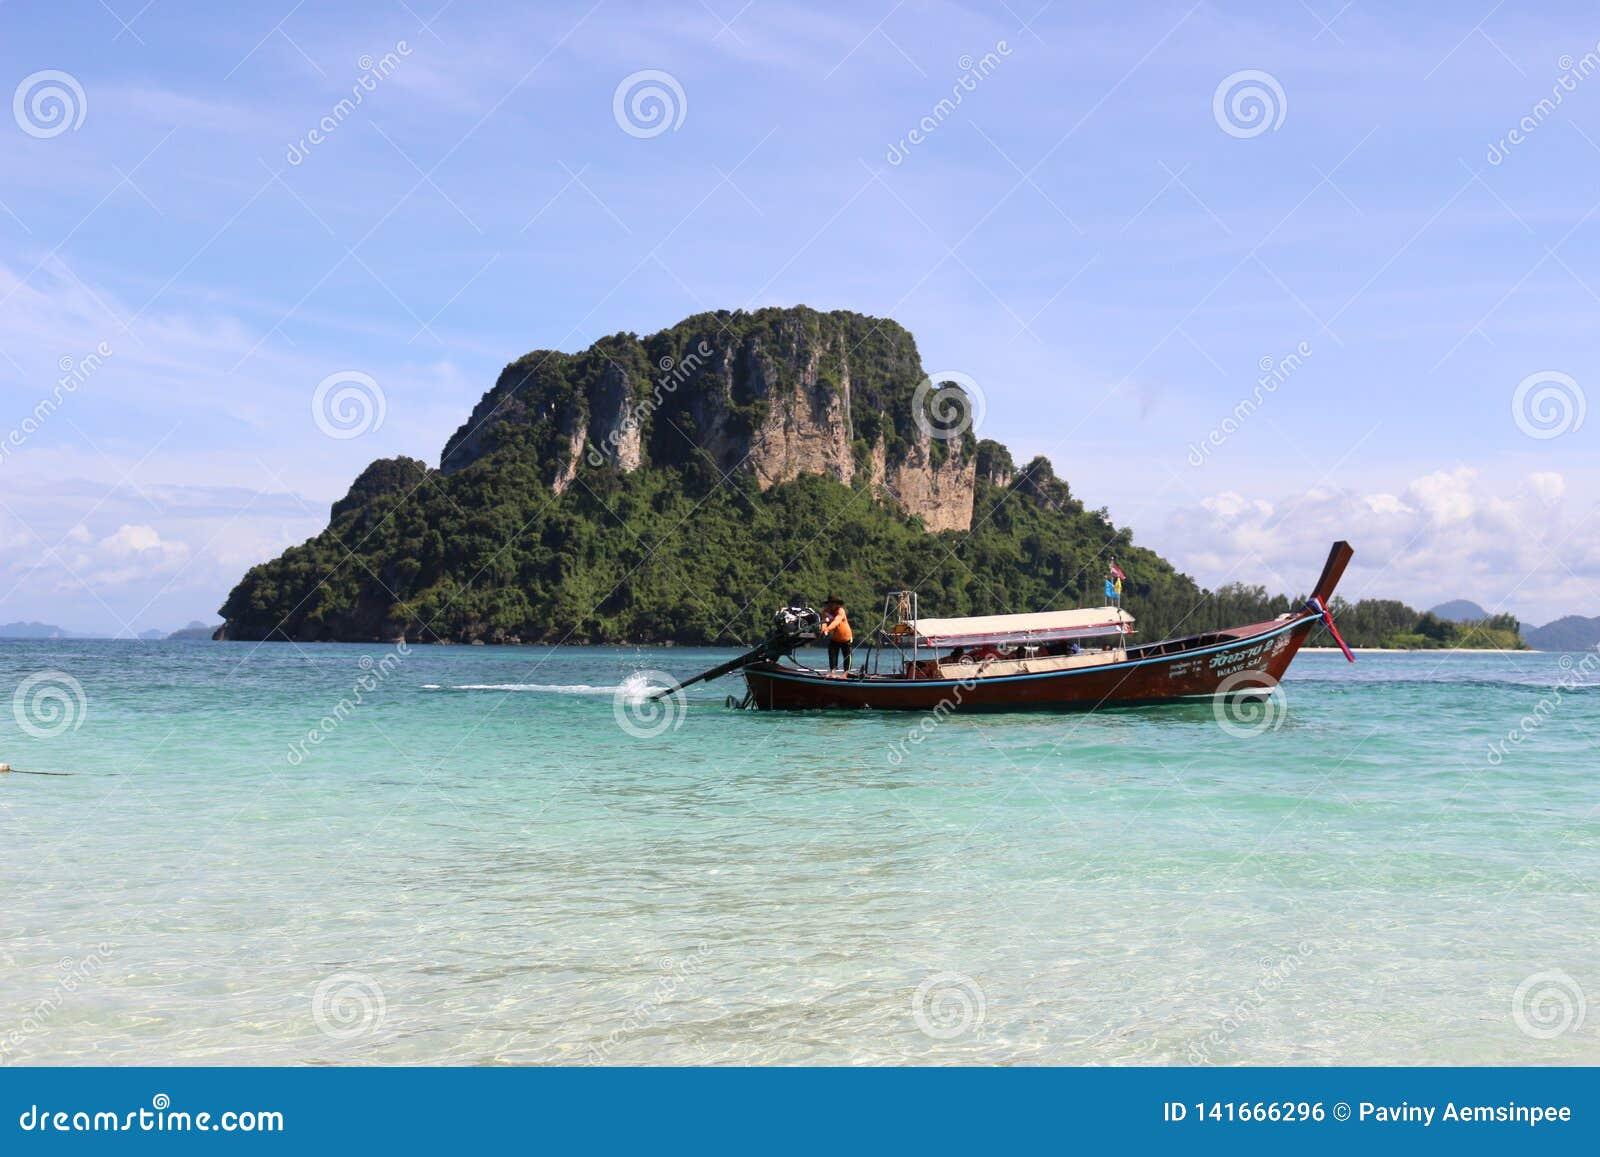 Krabi Province, Thailand, Thailand`s most popular tourist destinations